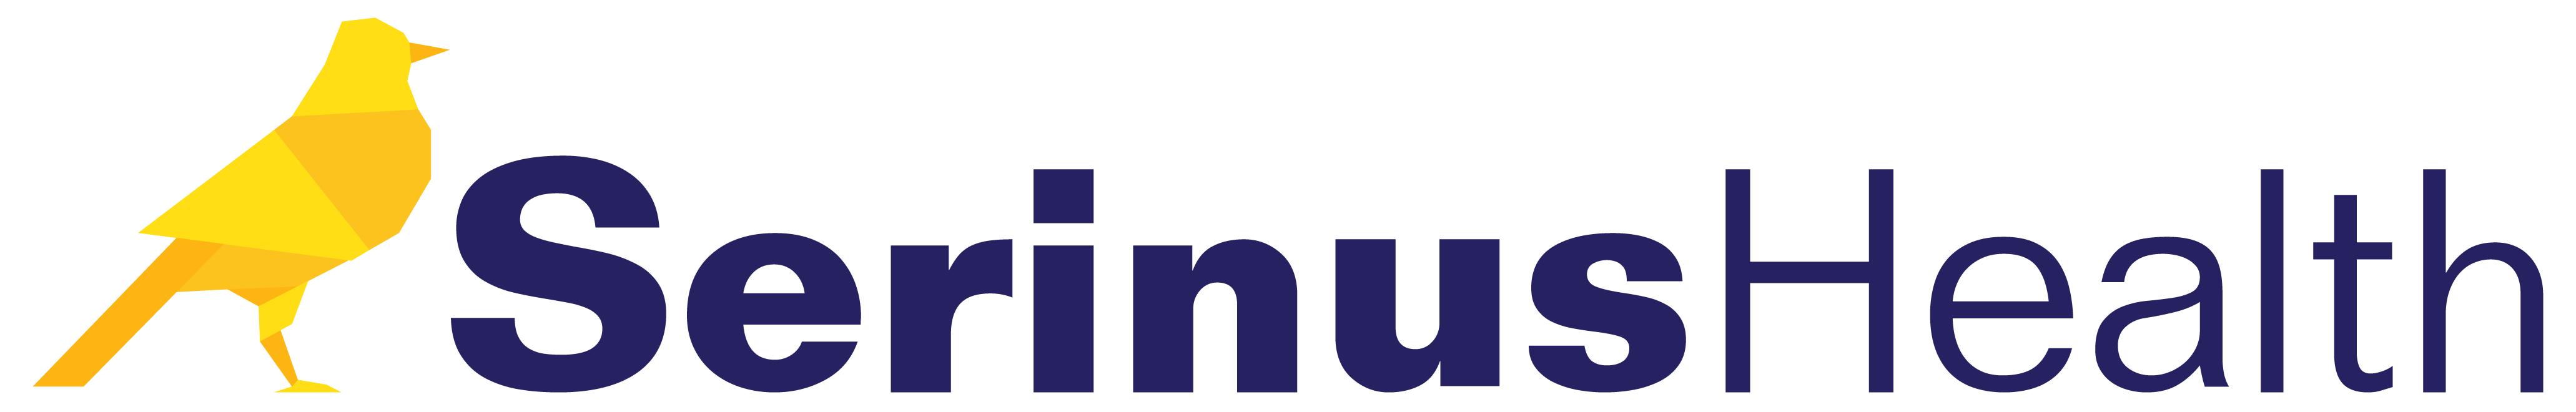 Serinus Health - Coming Soon